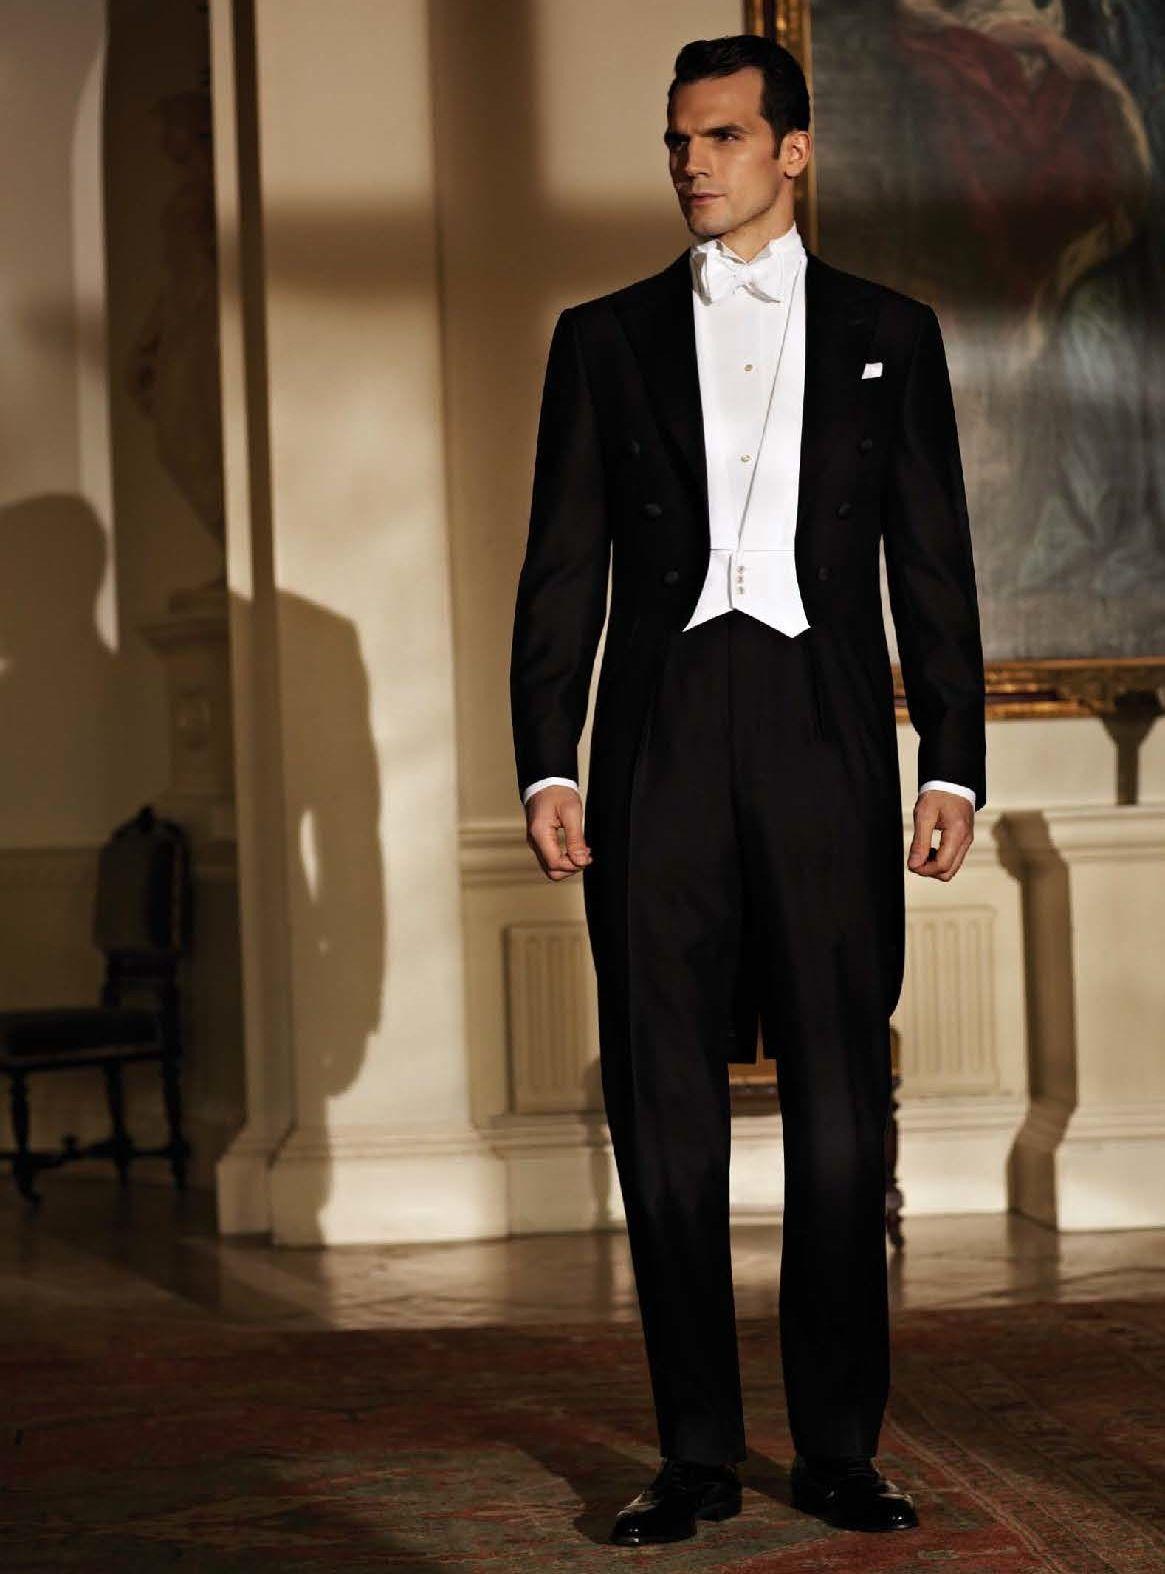 Ede Ravenscroft White Tie Black Suit Wedding Mens Fashion Classic White Tie Dress Code